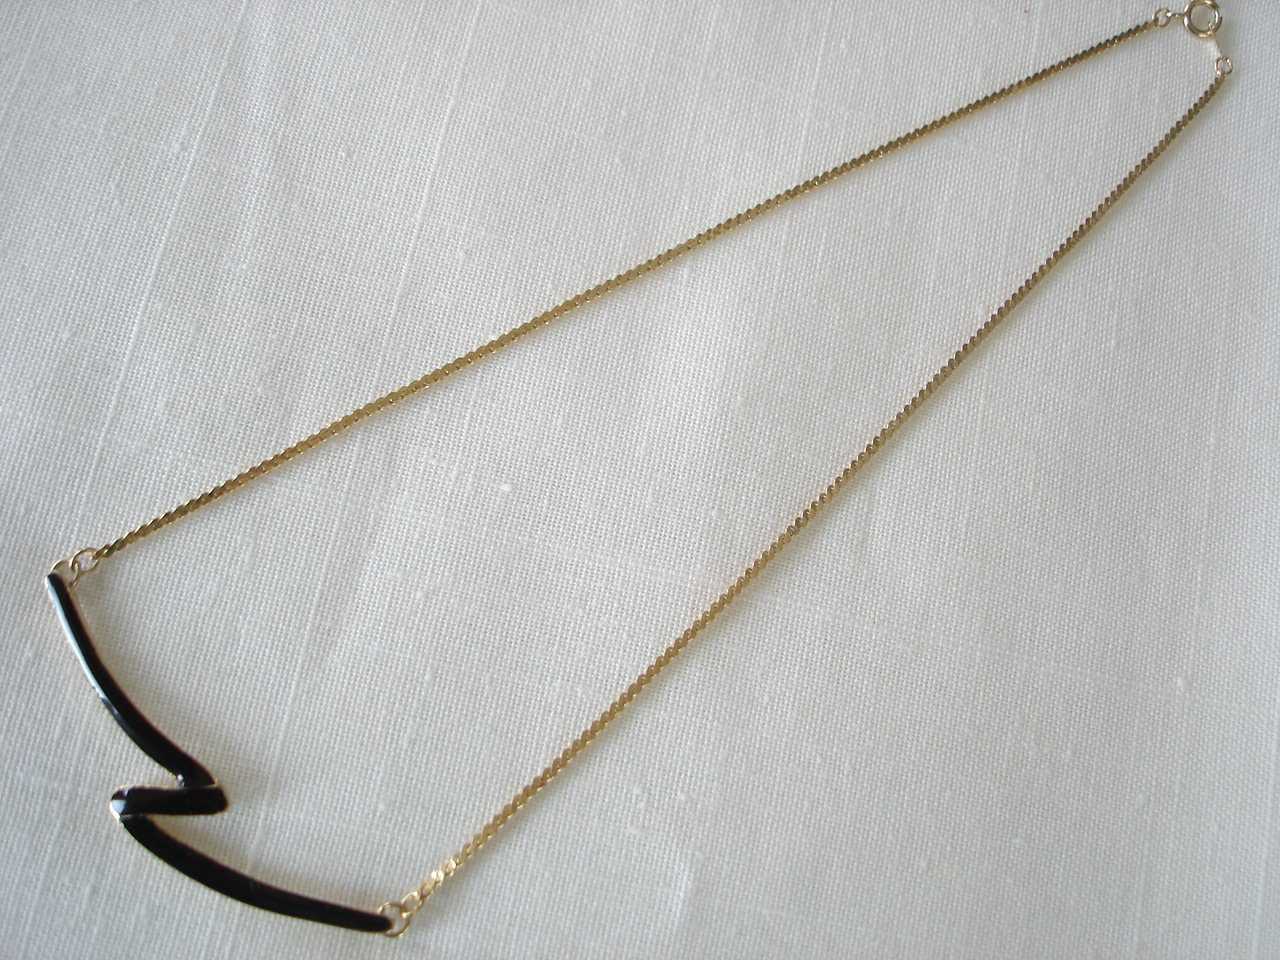 Z Goldtone Enameled Pendant Necklace, Chain